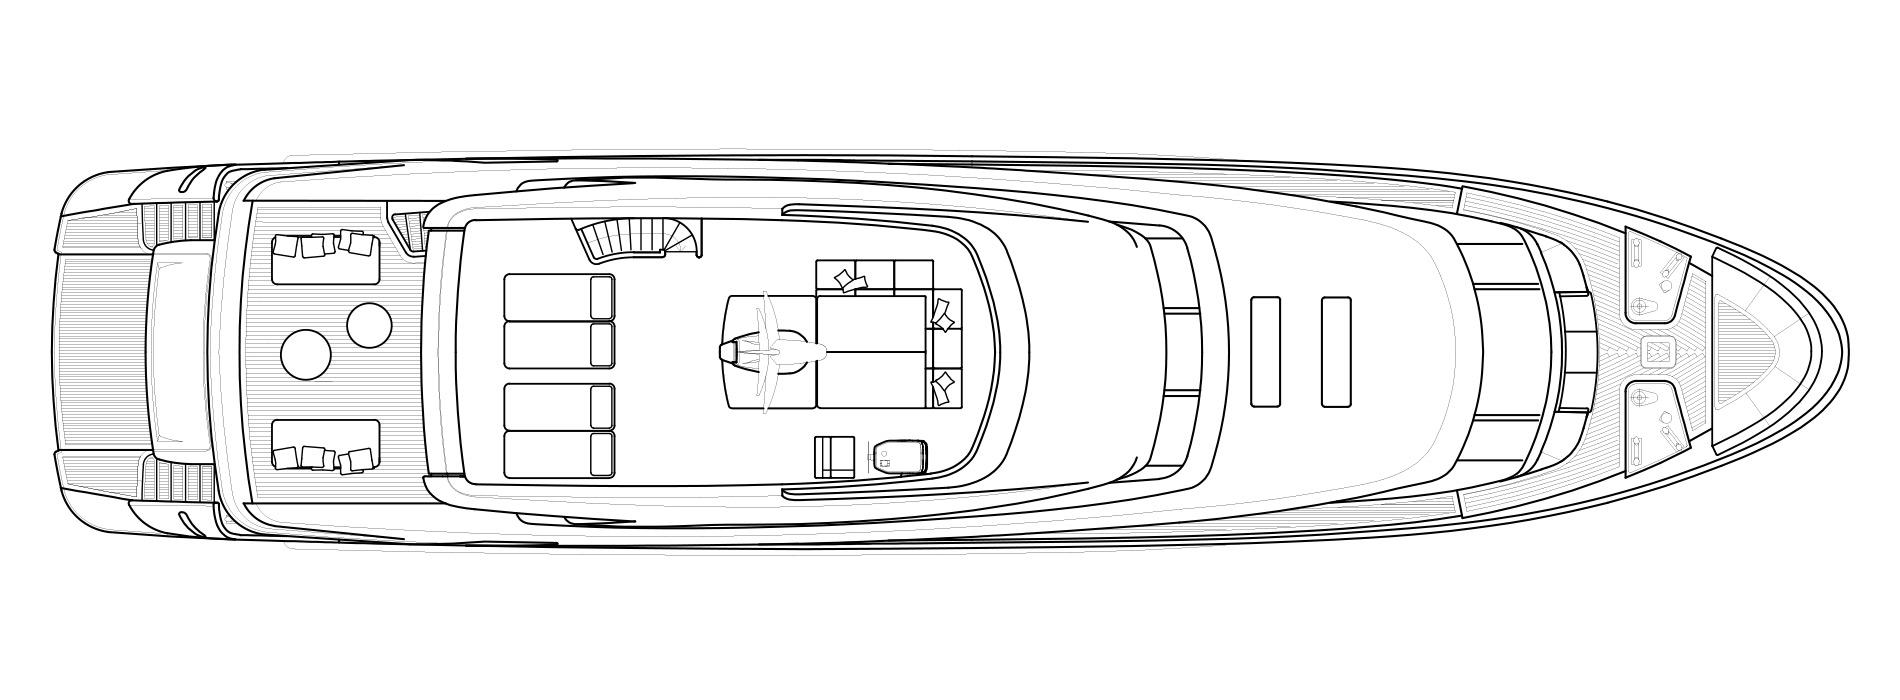 Sanlorenzo Yachts SD112 飞桥 Versione B